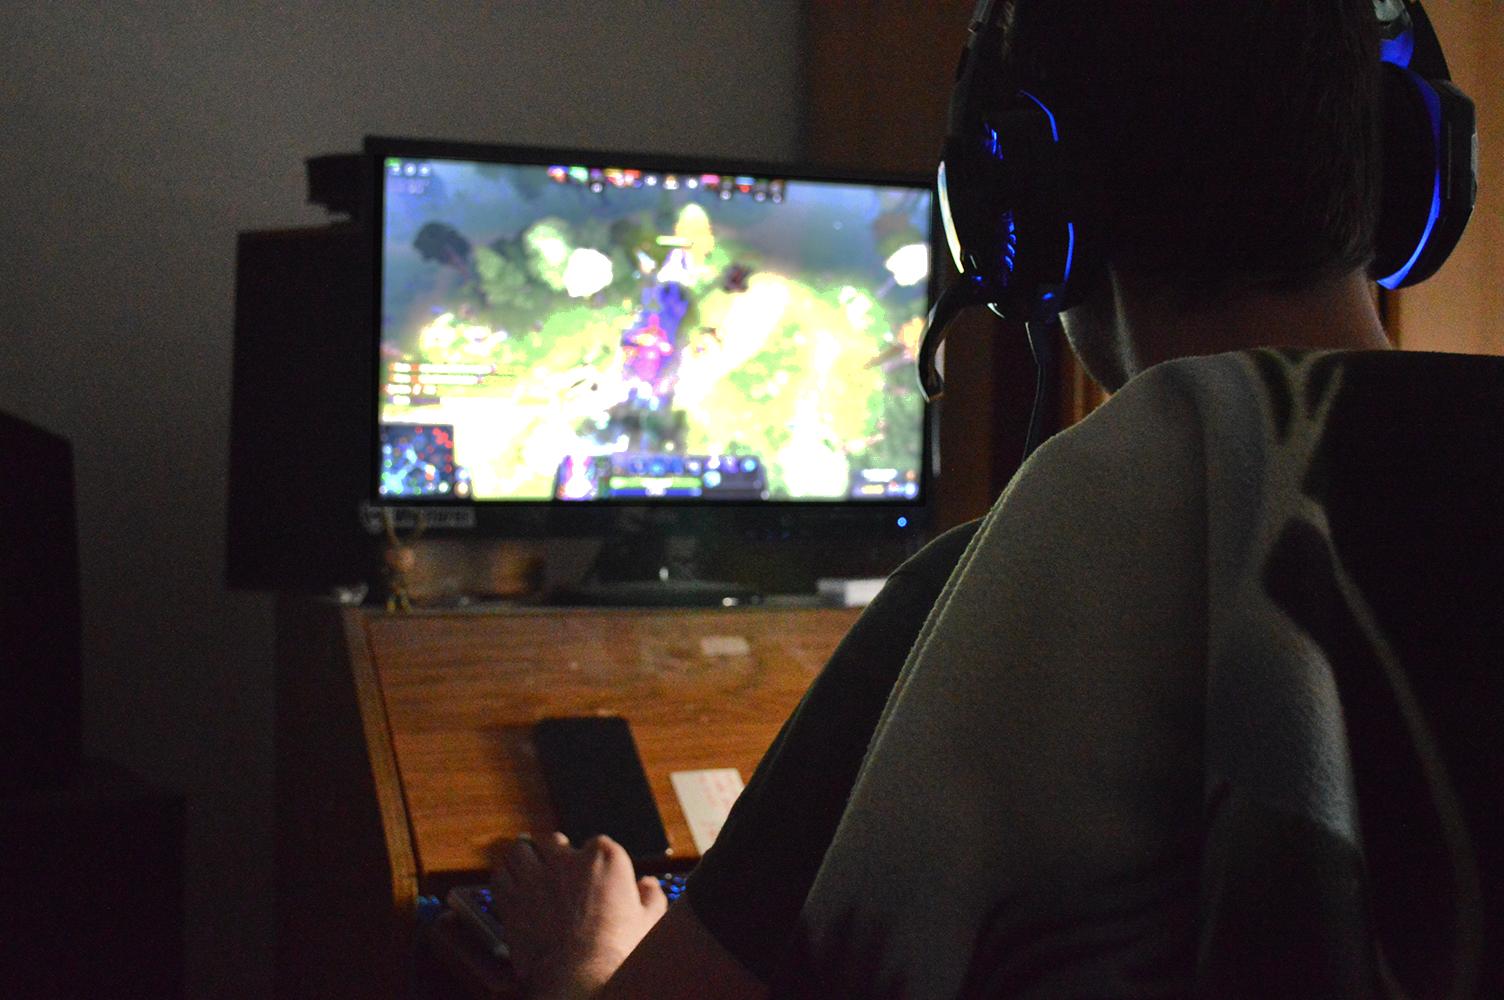 Hraní počítačových her | Autor: Kristýna Sklenářová